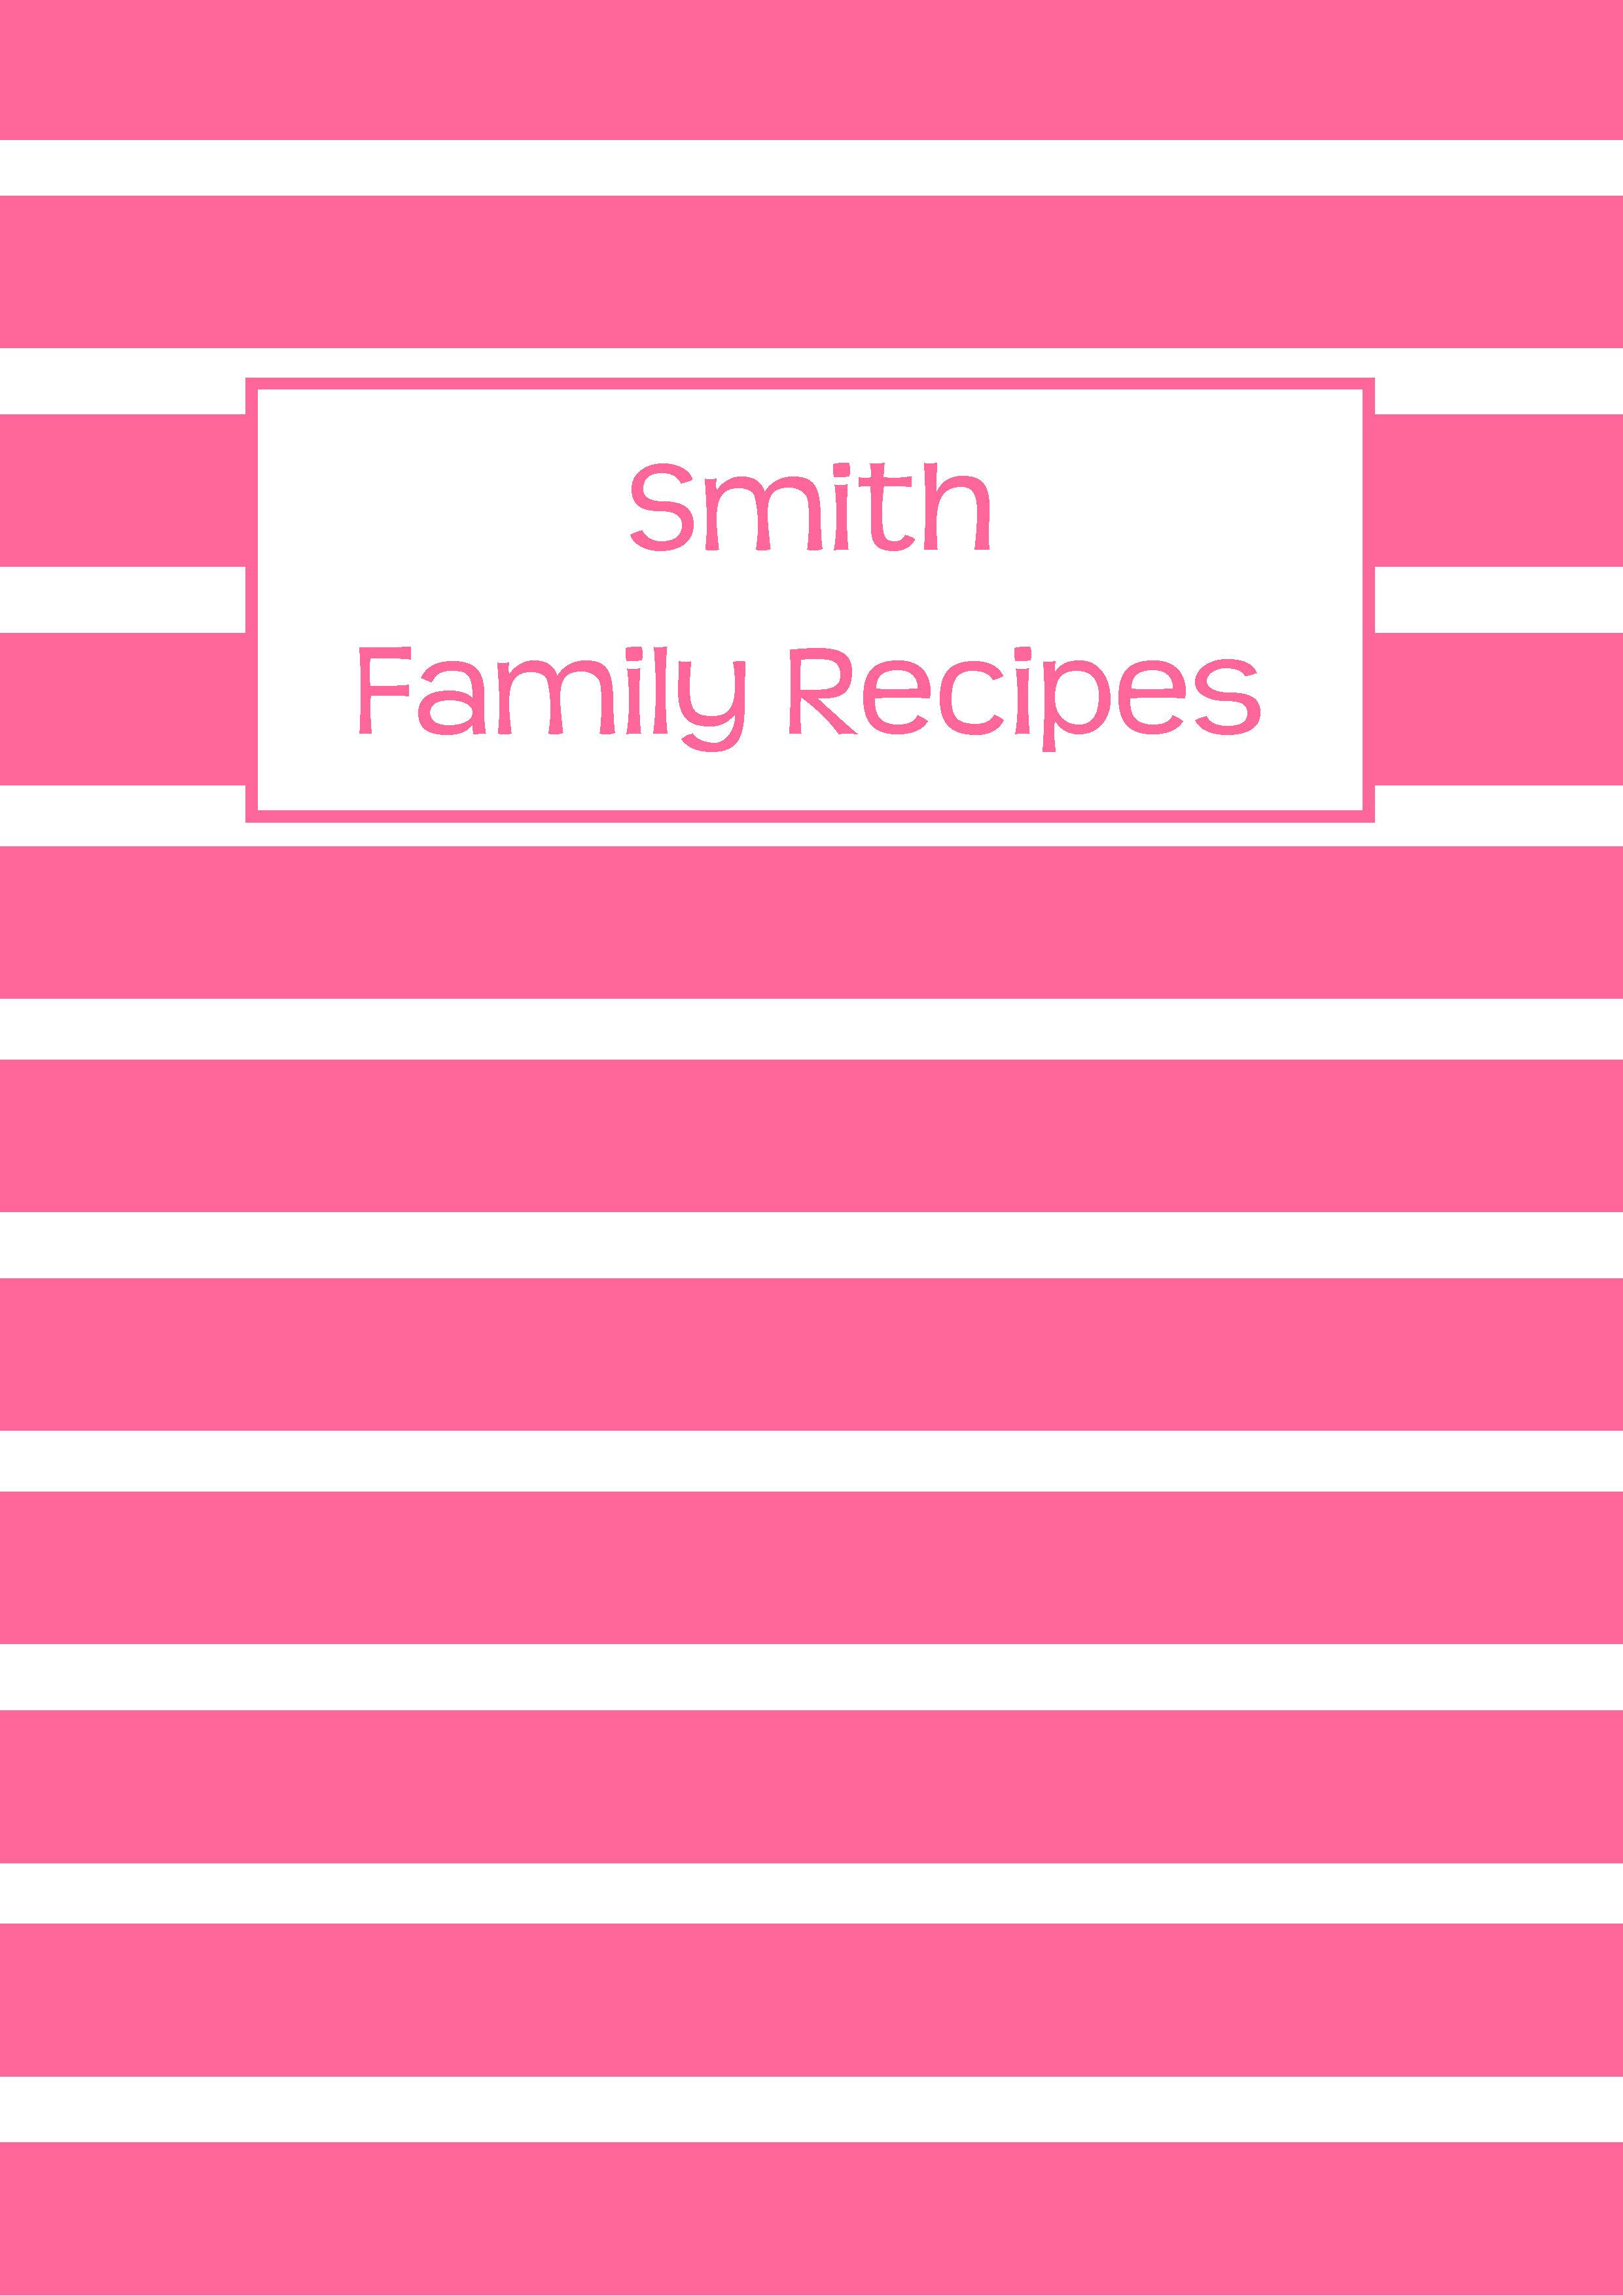 Full page recipe templates binder maxwellsz